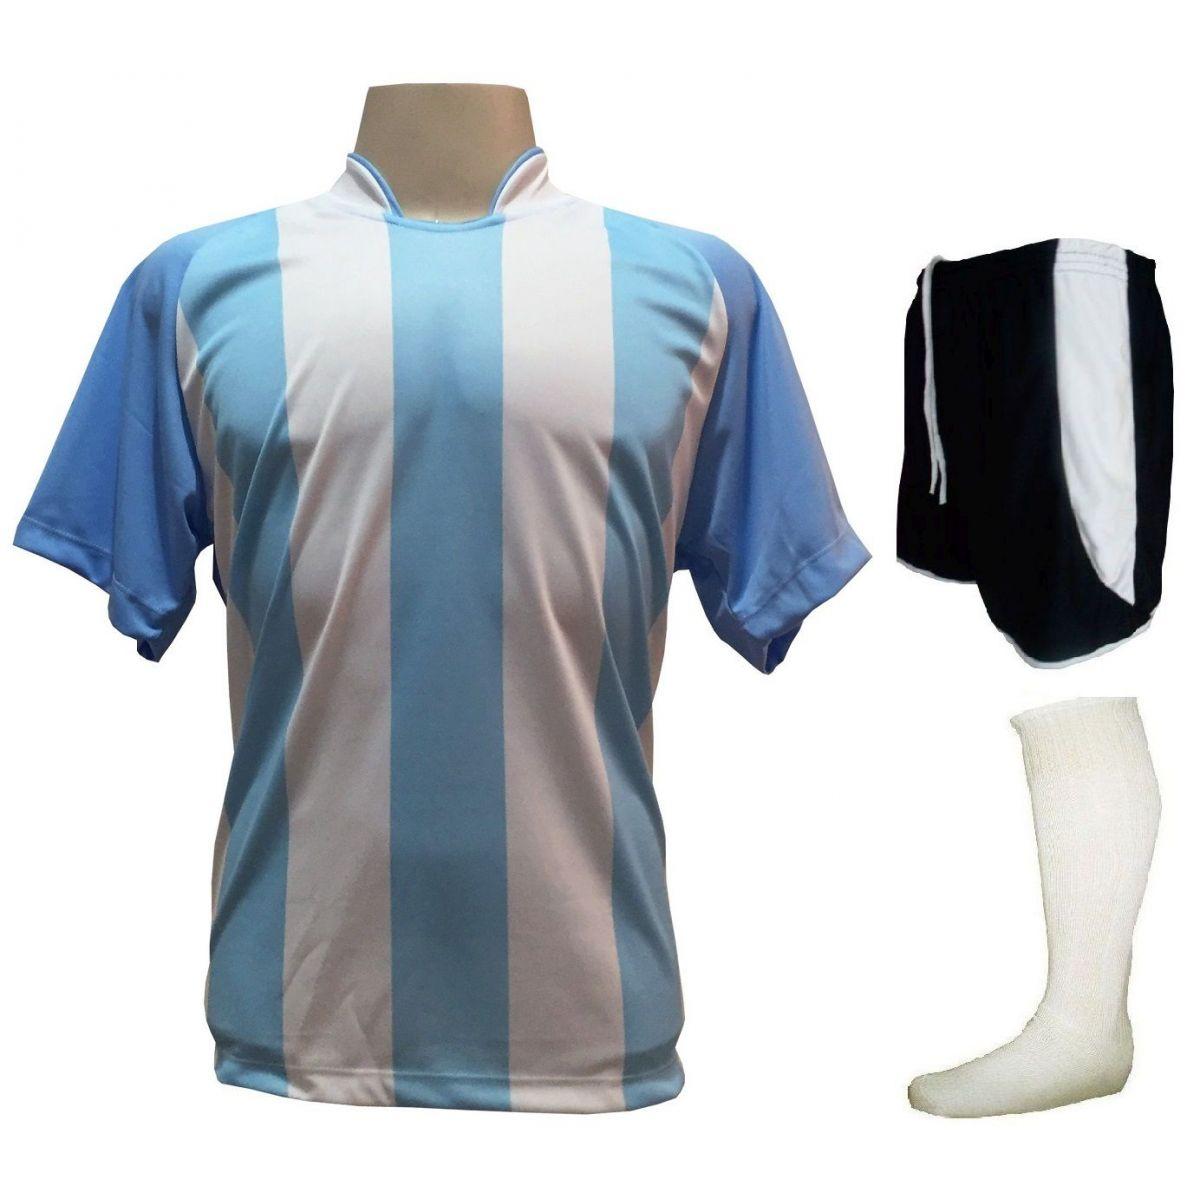 Fardamento Completo modelo Milan 20+1 (20 camisas Celeste/Branco + 20 calções modelo Copa Preto/Branco + 20 pares de meiões Branco + 1 conjunto de goleiro) + Brindes